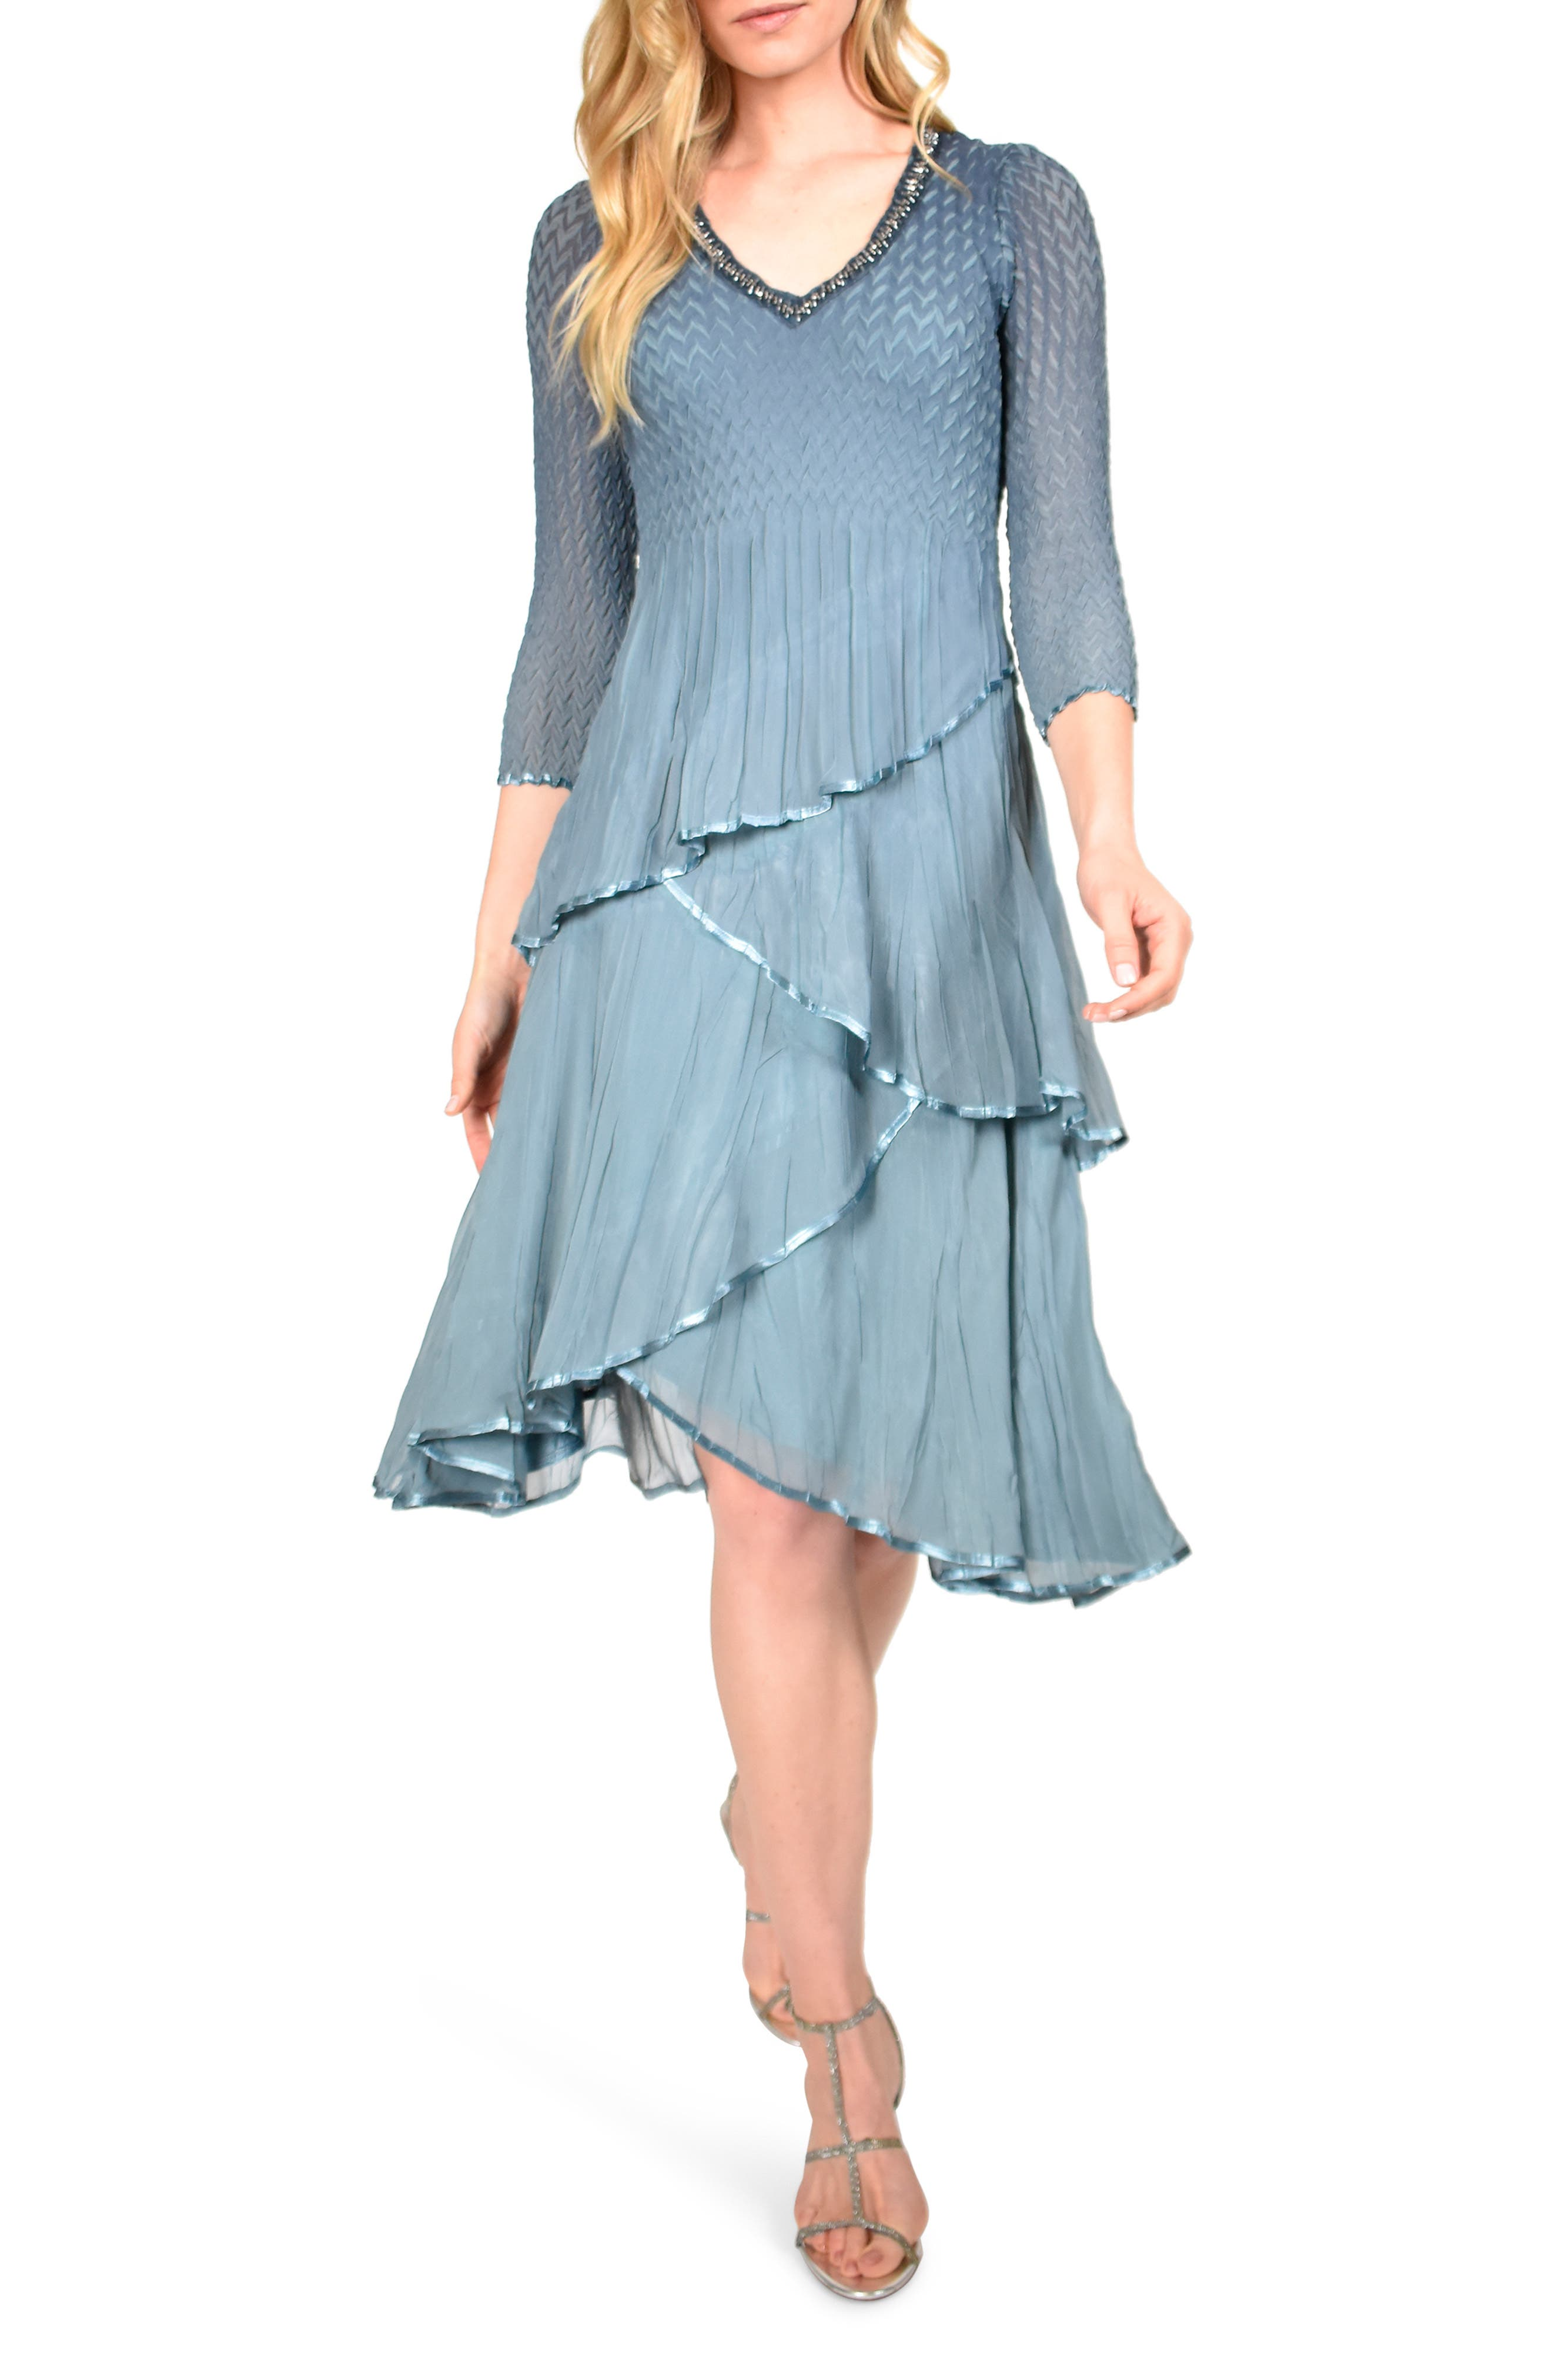 Vintage 1920s Dresses – Where to Buy Womens Komarov Tiered Chiffon Dress $398.00 AT vintagedancer.com